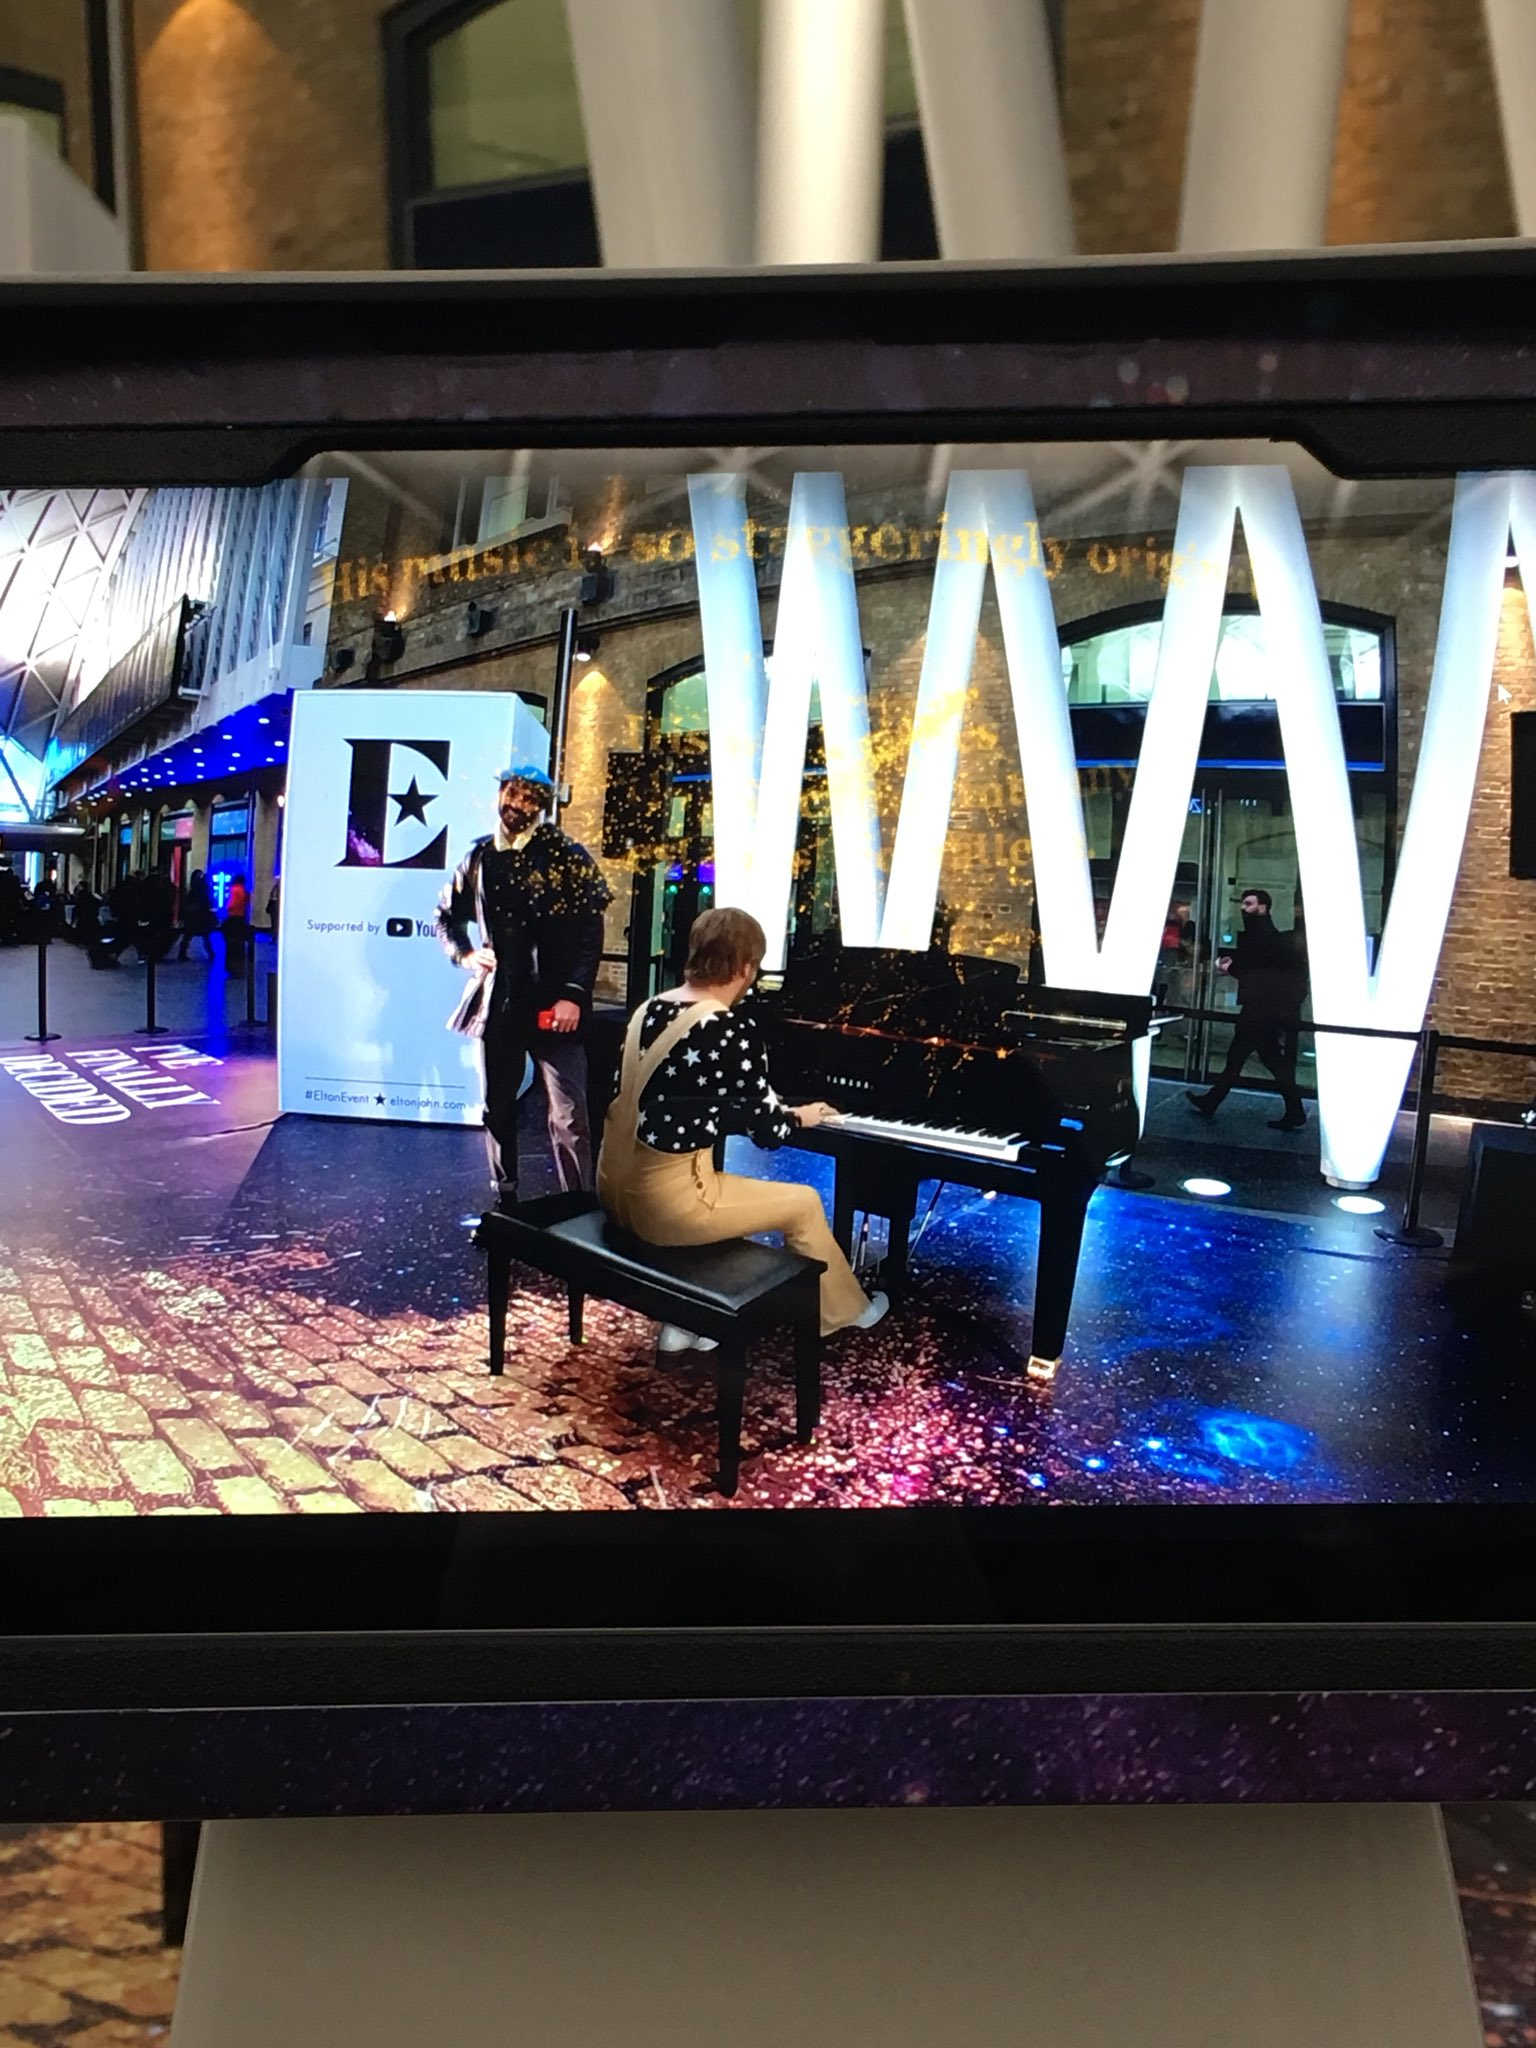 RT @HjalmarssonEmma: We found Elton at Kings Cross! #EltonEvent https://t.co/jHyUsLhWay